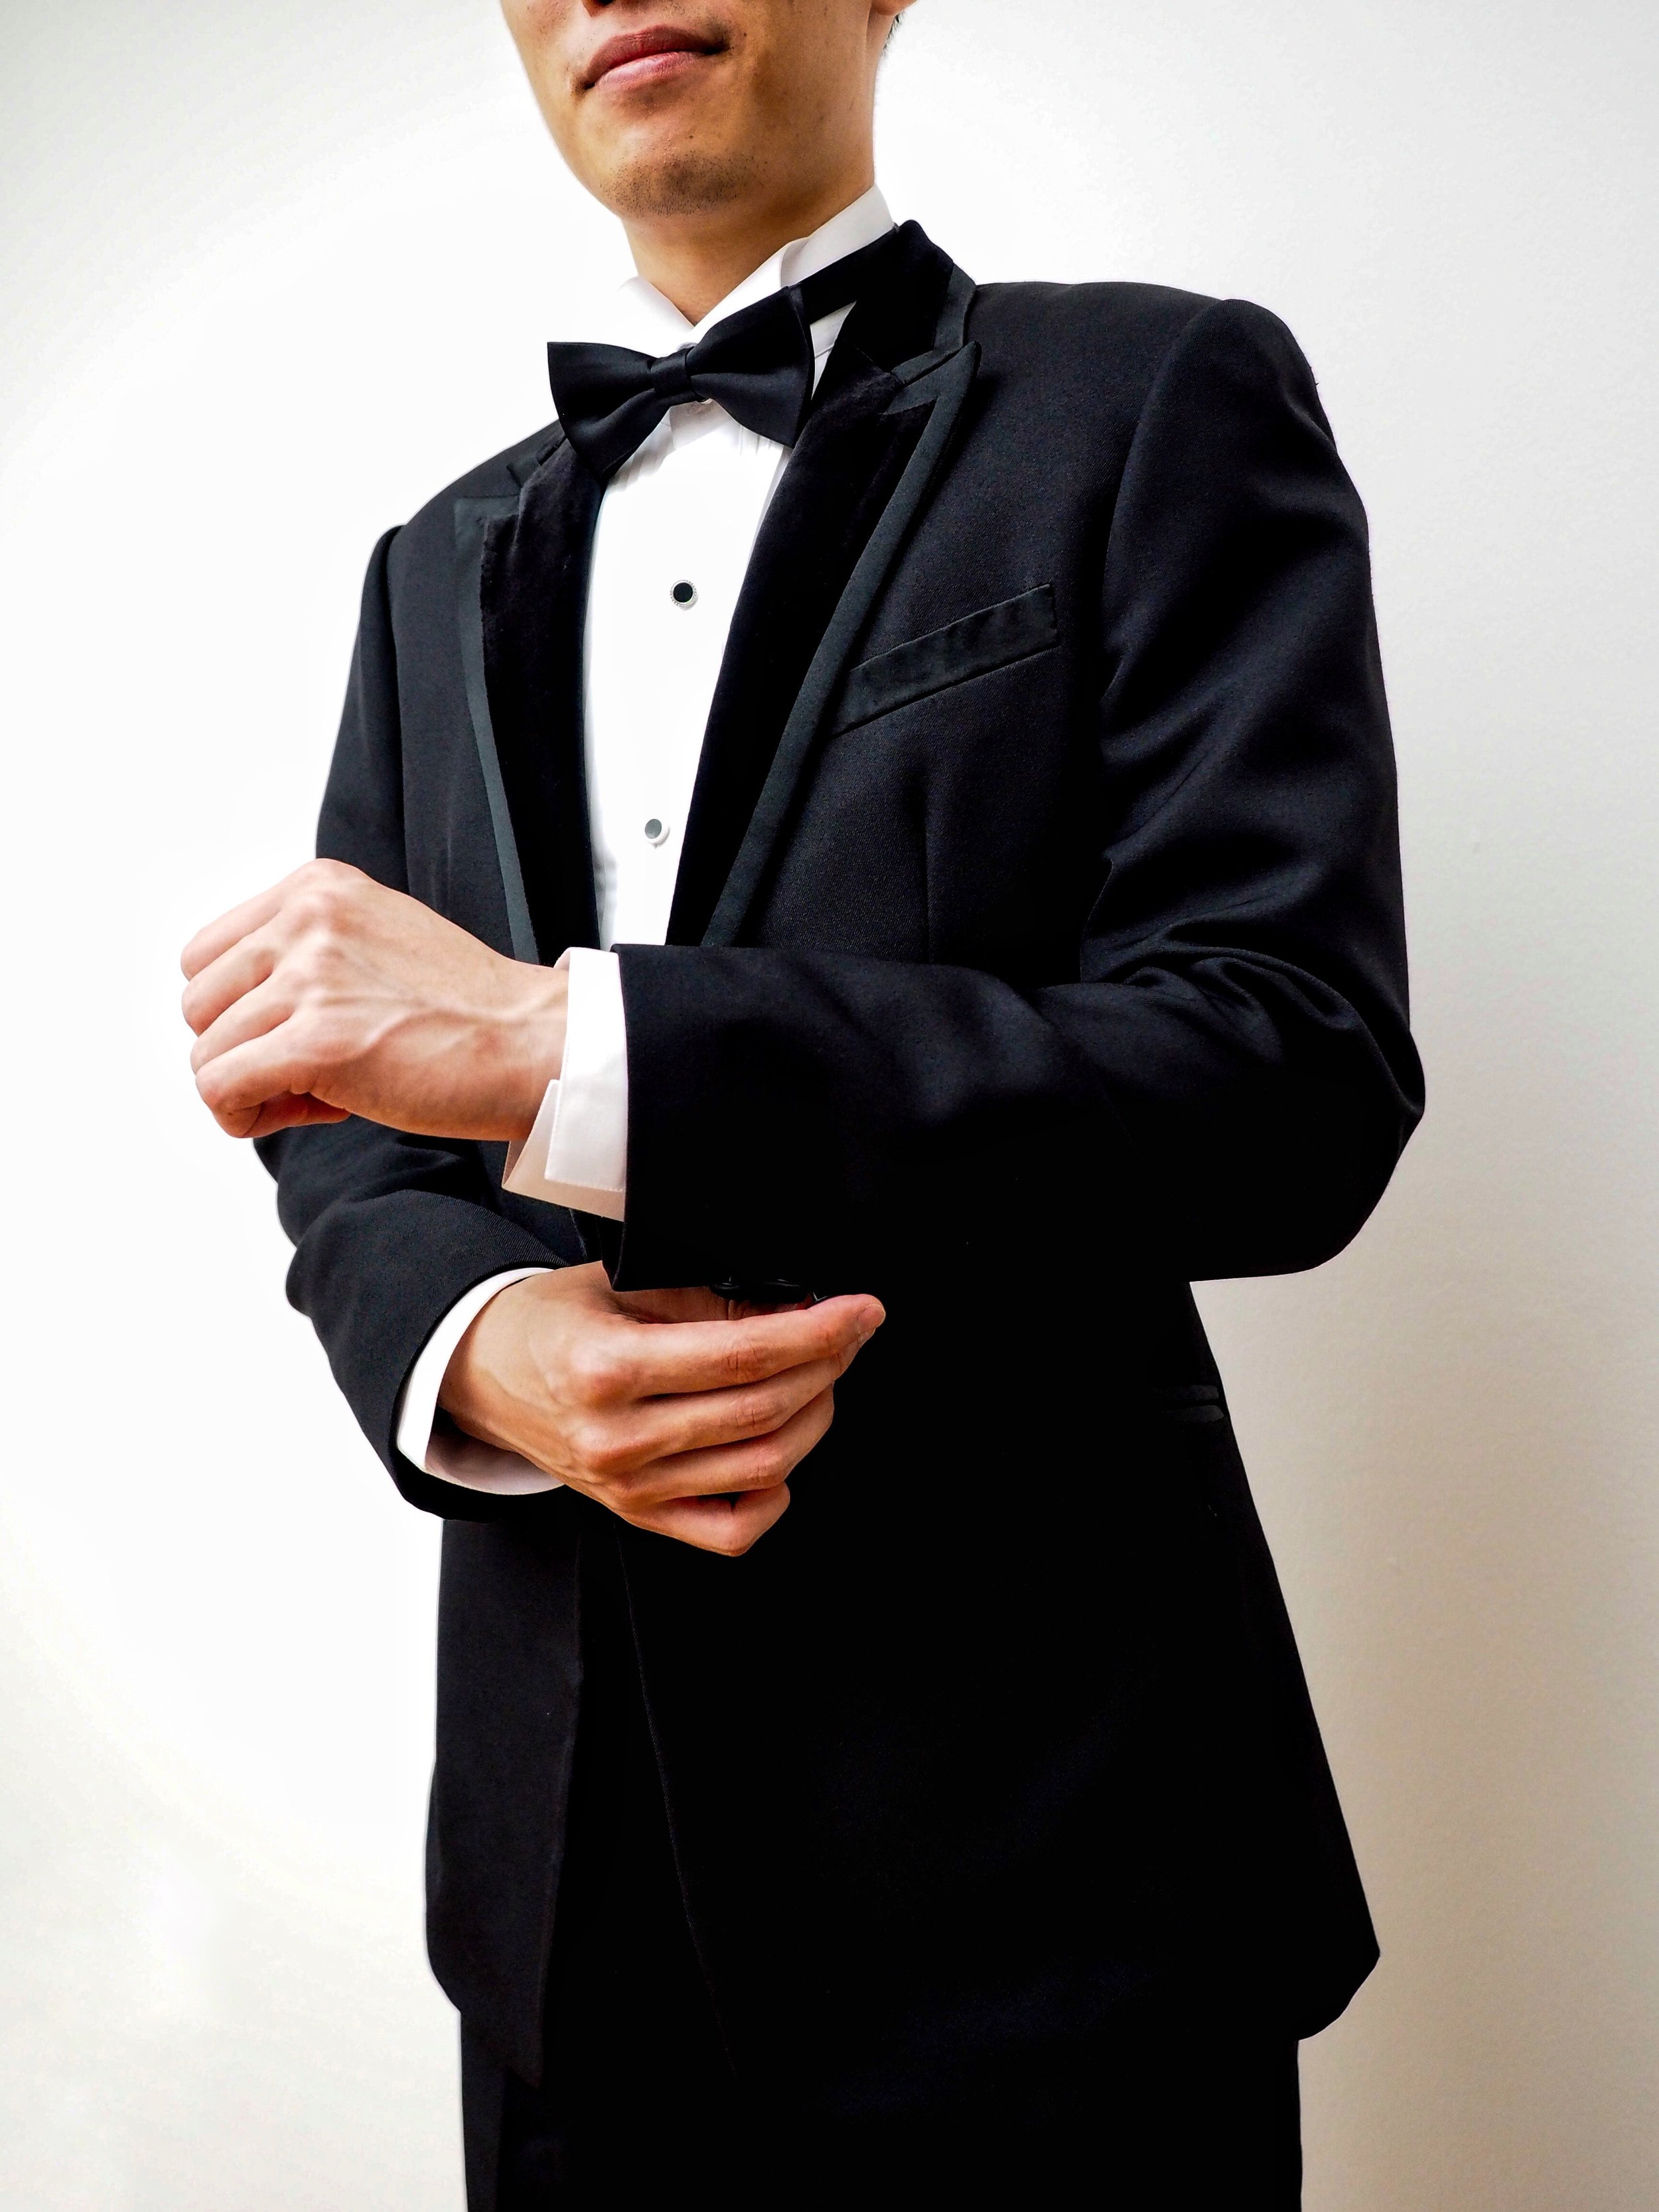 Velvet lapels on black tux by CCM Wedding